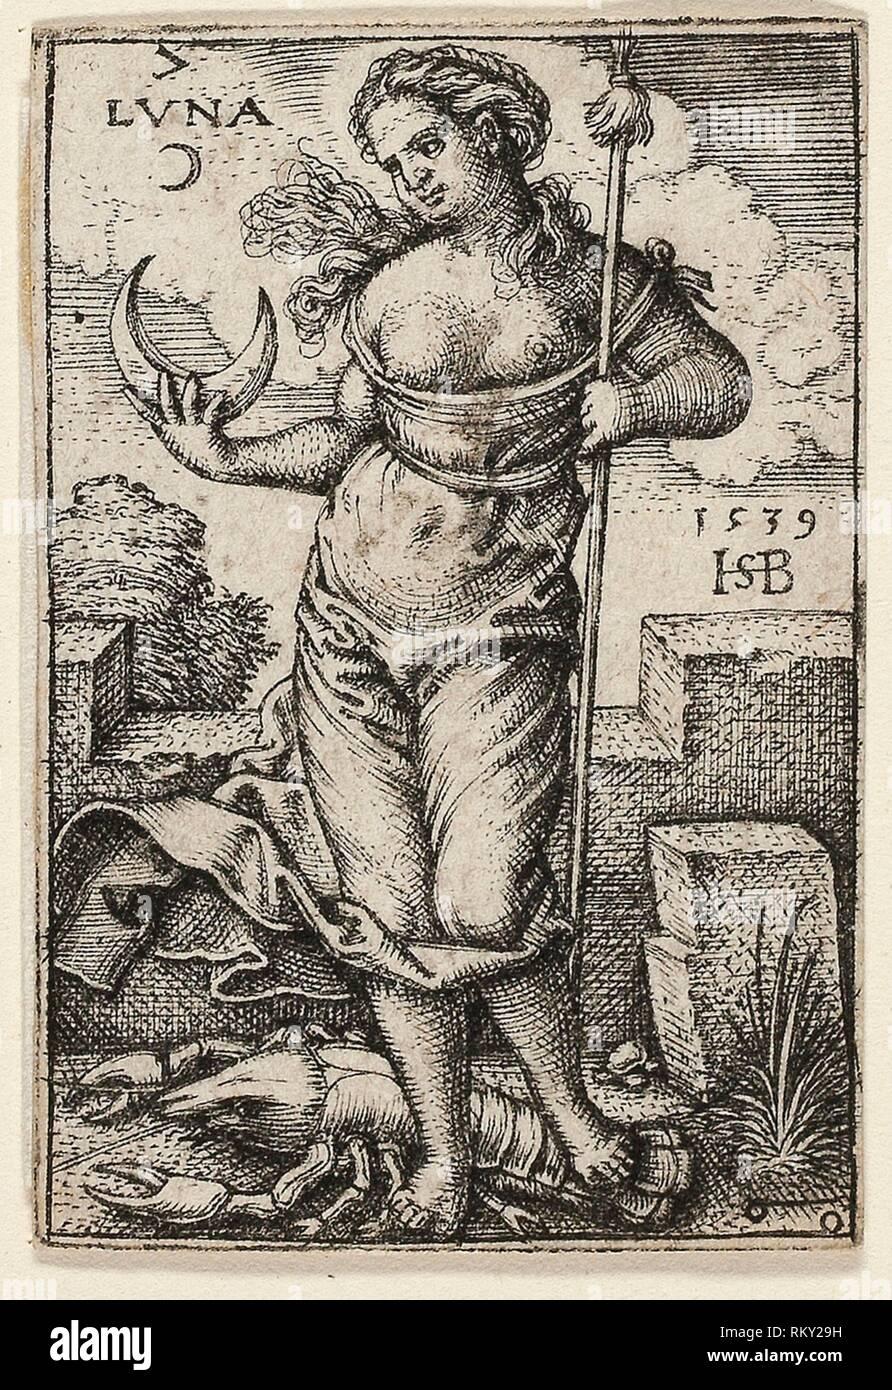 Moon, plate seven from The Seven Planets with the Zodiacs - 1539 - Sebald Beham German, 1500-1550 - Artist: Hans Sebald Beham, Origin: Germany, Date: - Stock Image